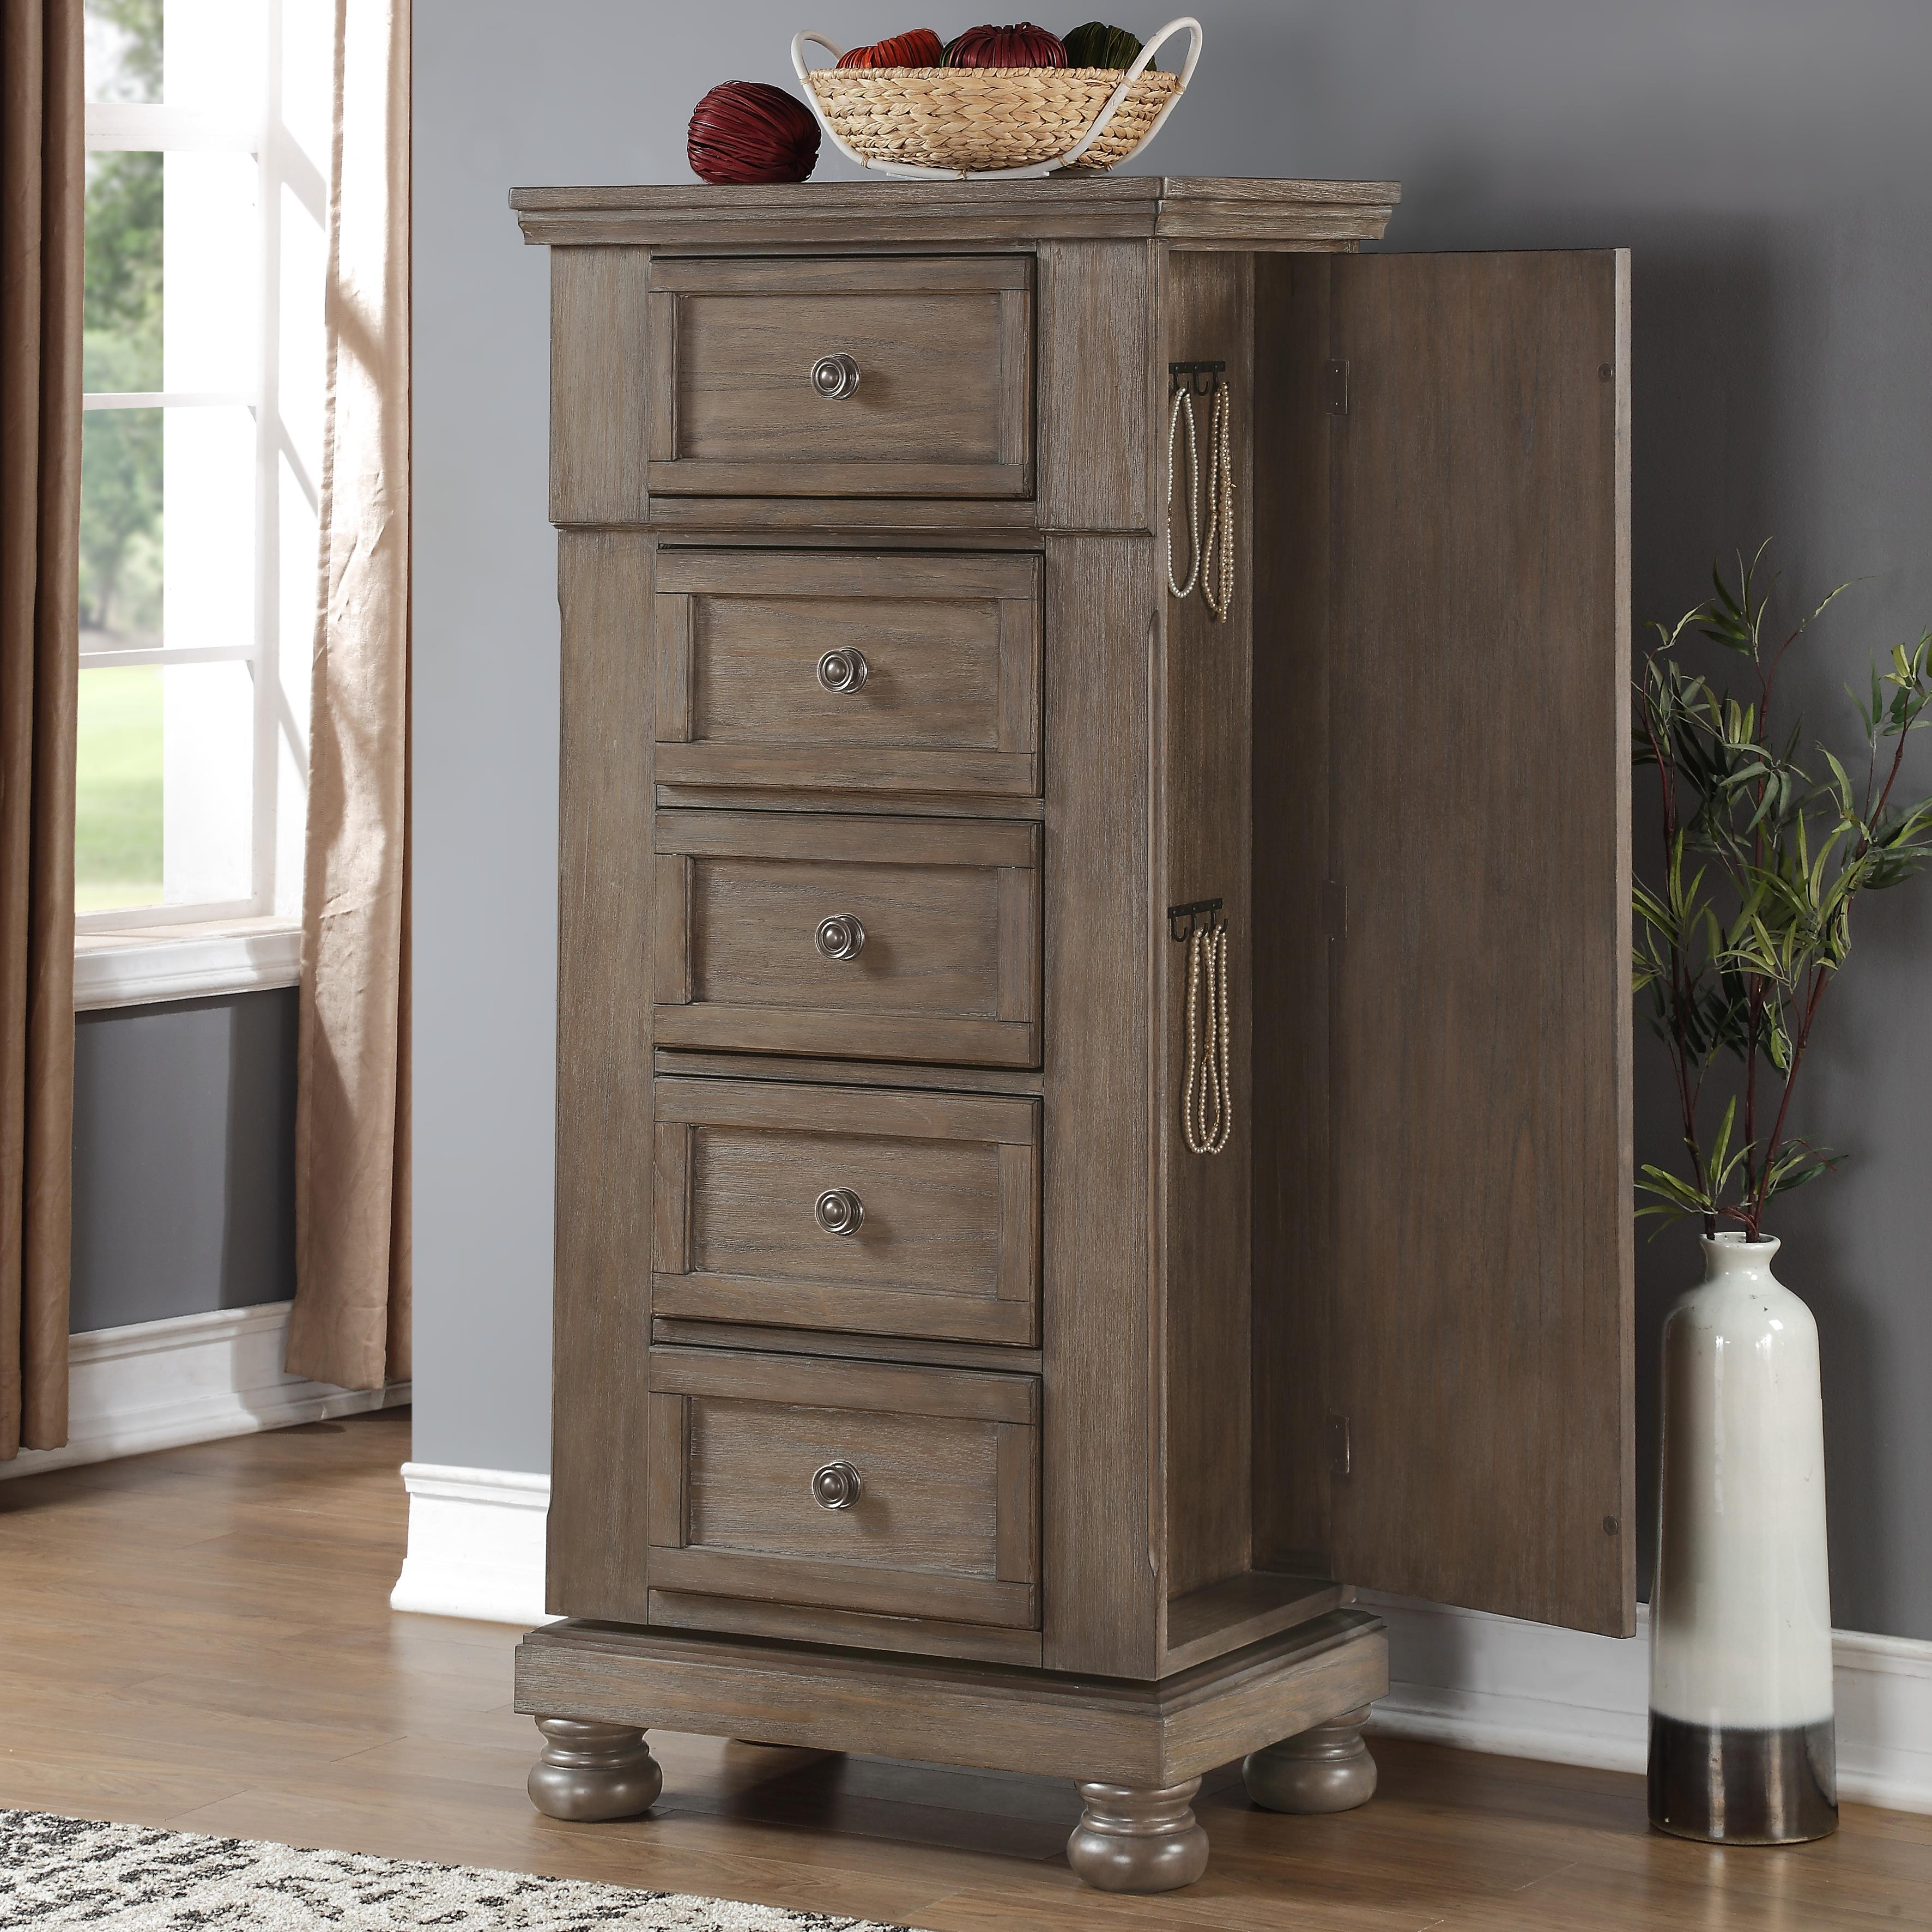 new classic allegra 5 drawer lingerie swivel chest darvin furniture lingerie chests. Black Bedroom Furniture Sets. Home Design Ideas